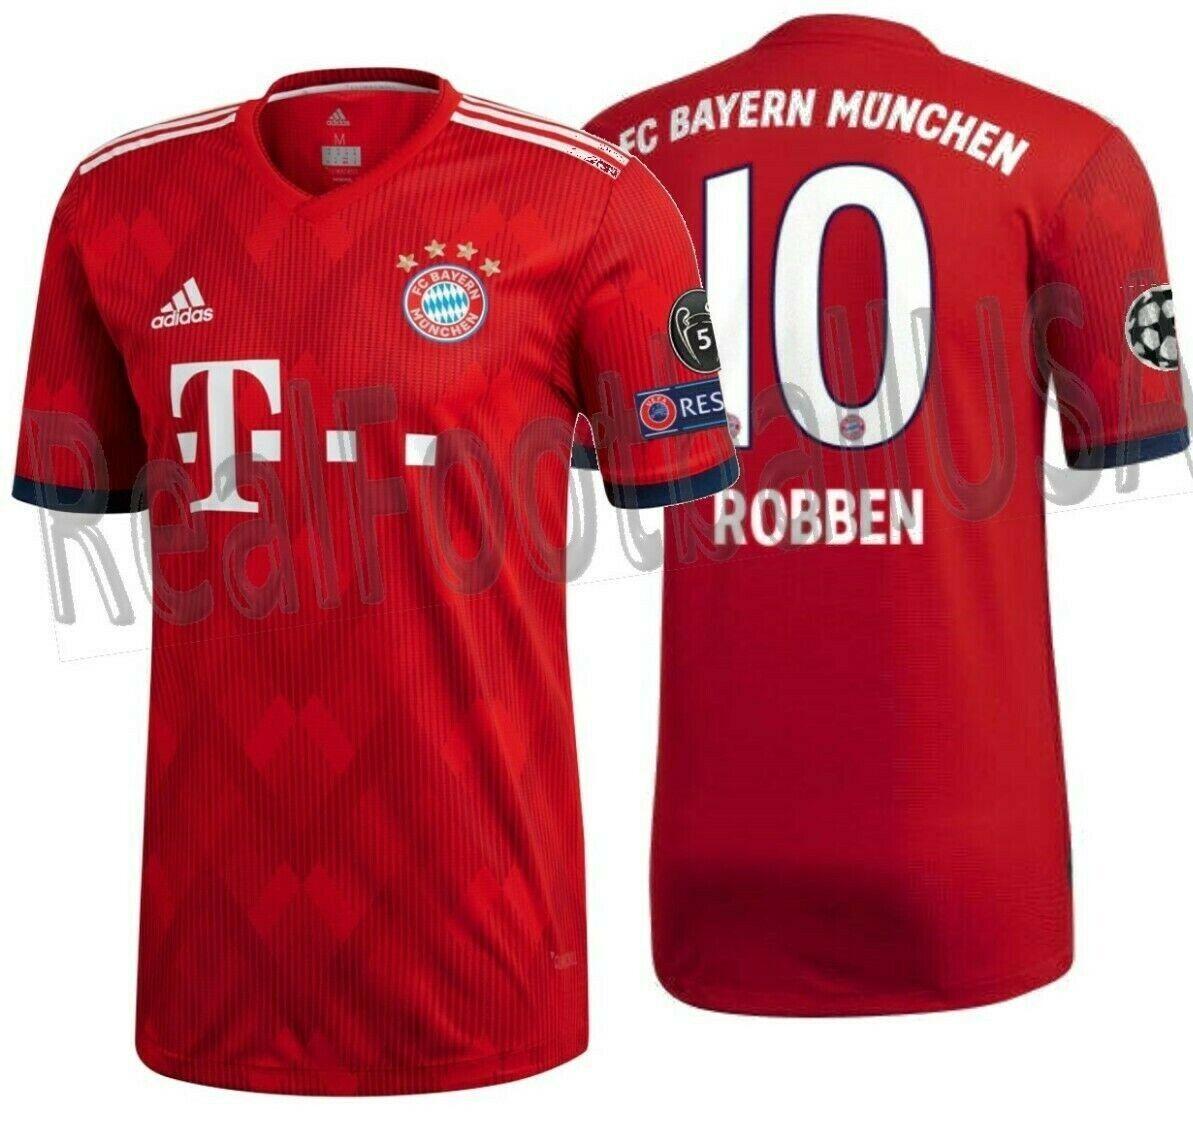 Adidas Arjen Robben Bayern Munich Auténtico Partido Ucl Home Jersey 2018 19